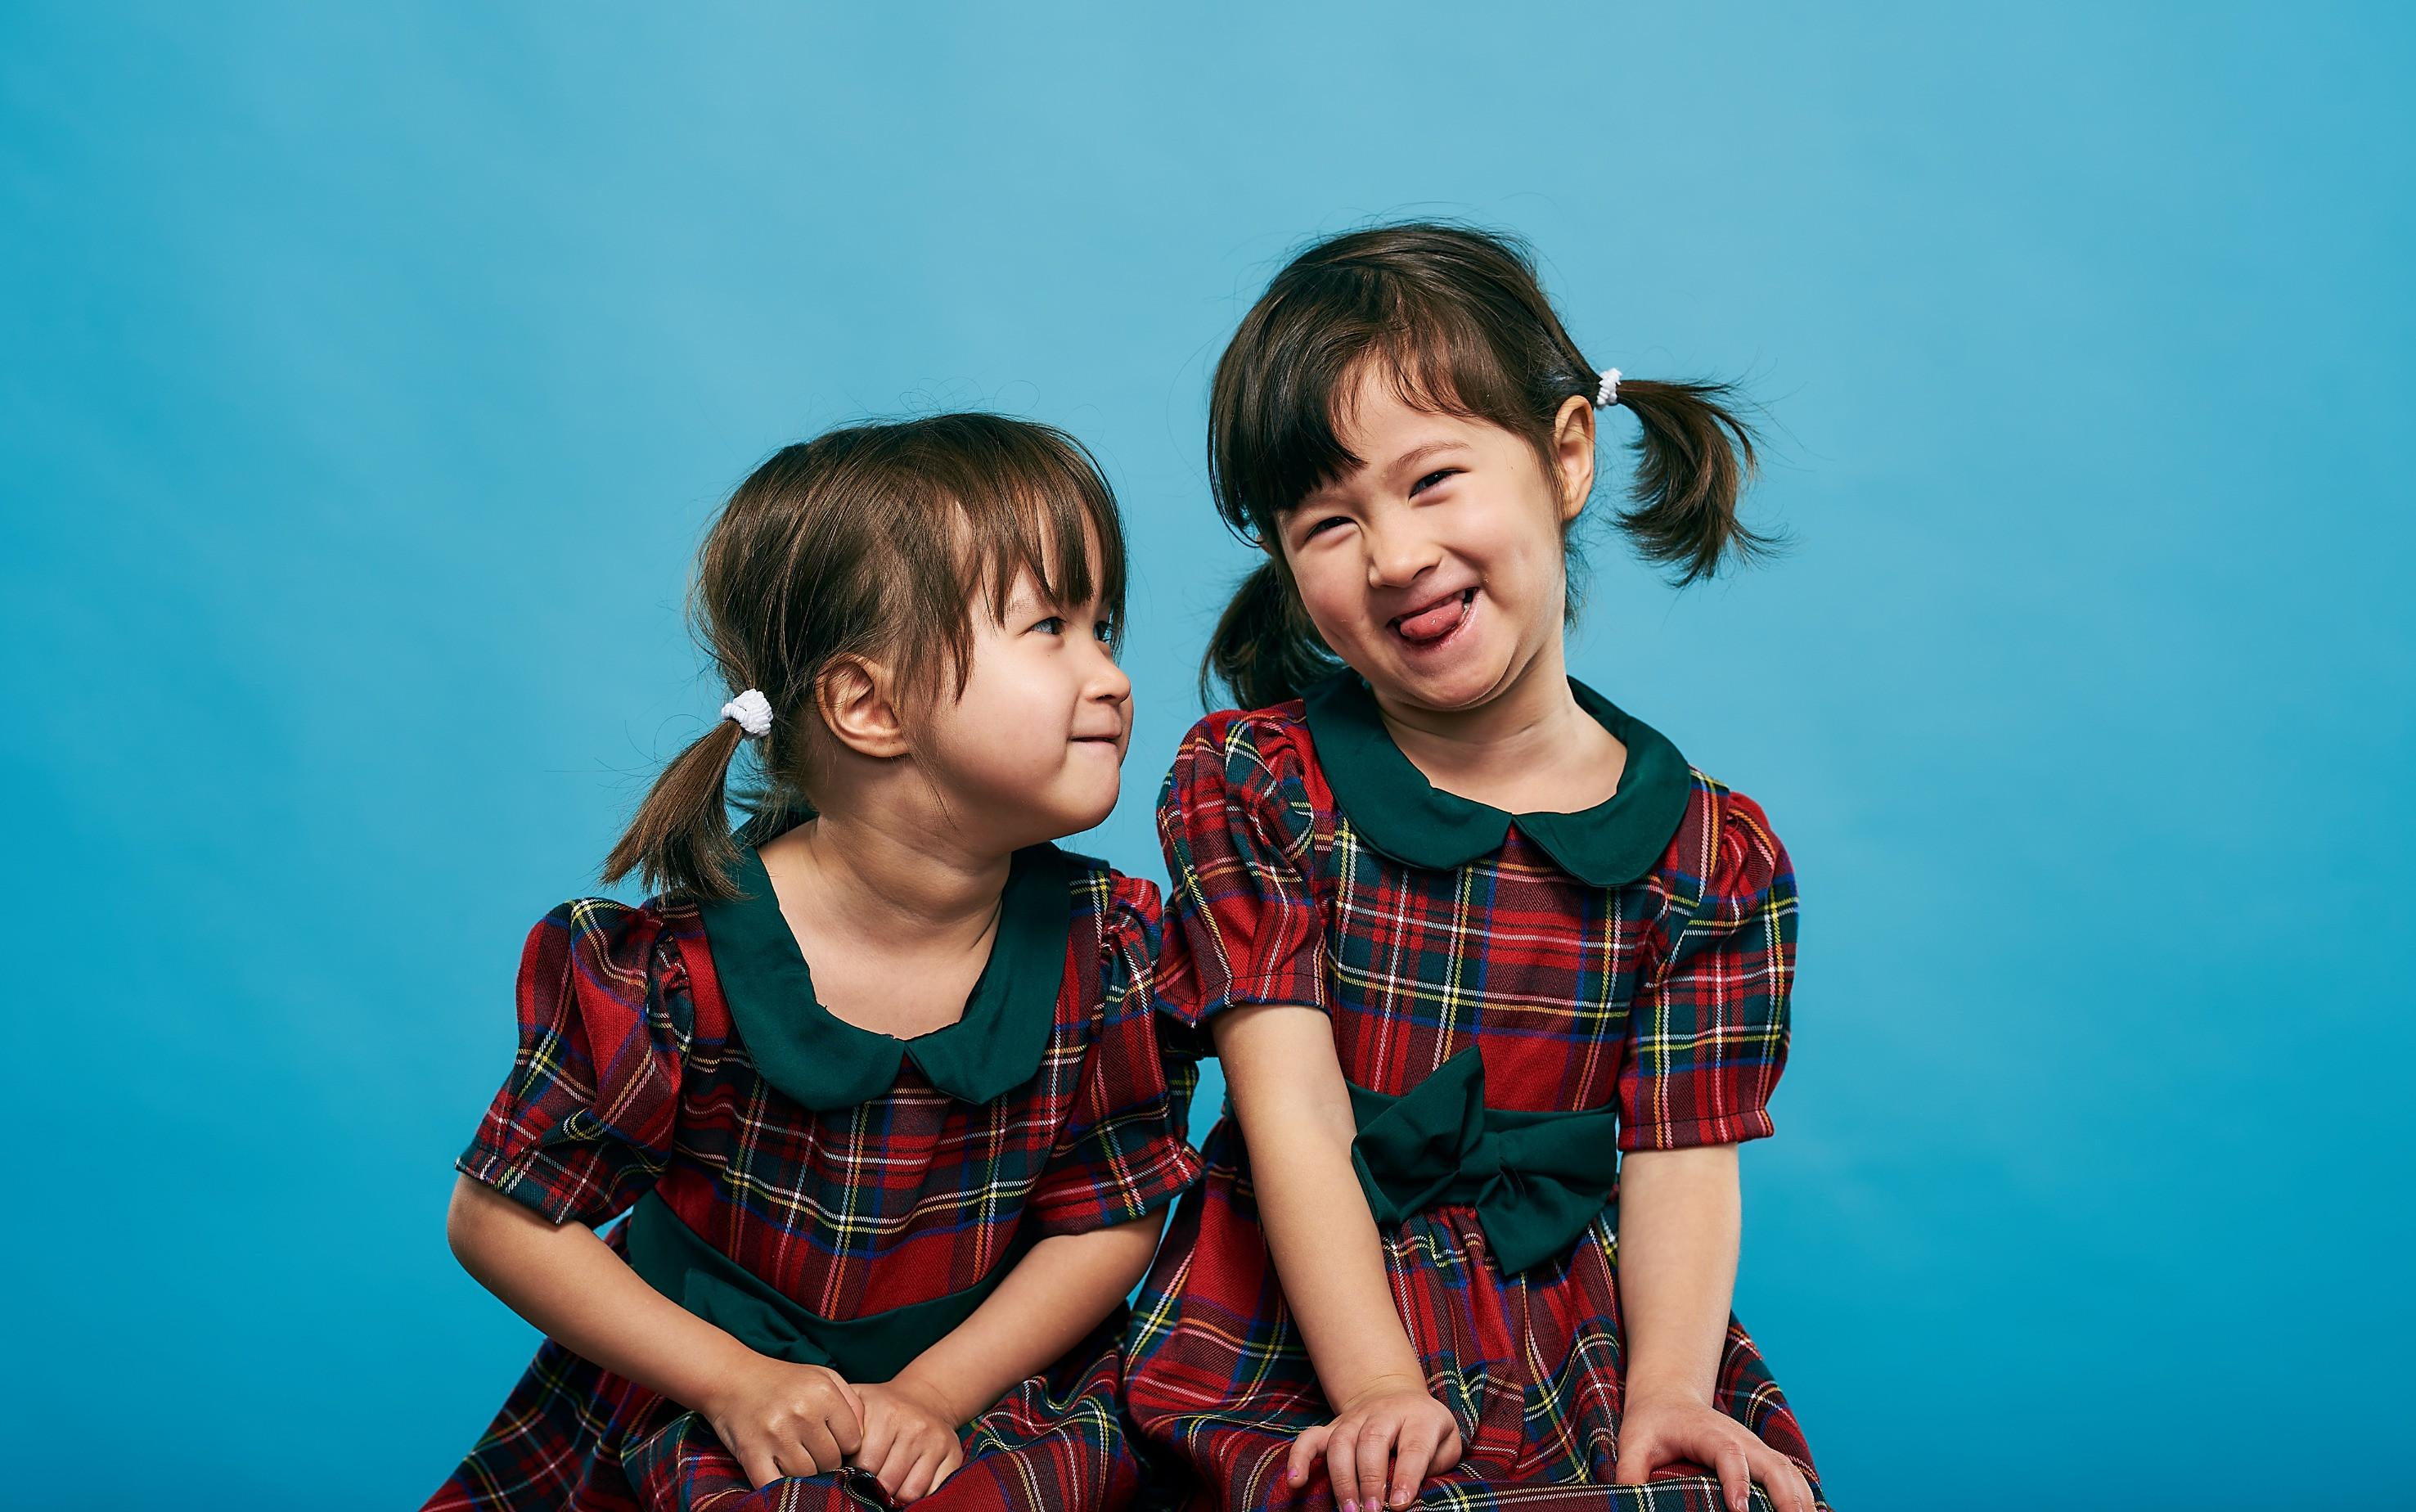 School Photo Shoot - 2 Kids